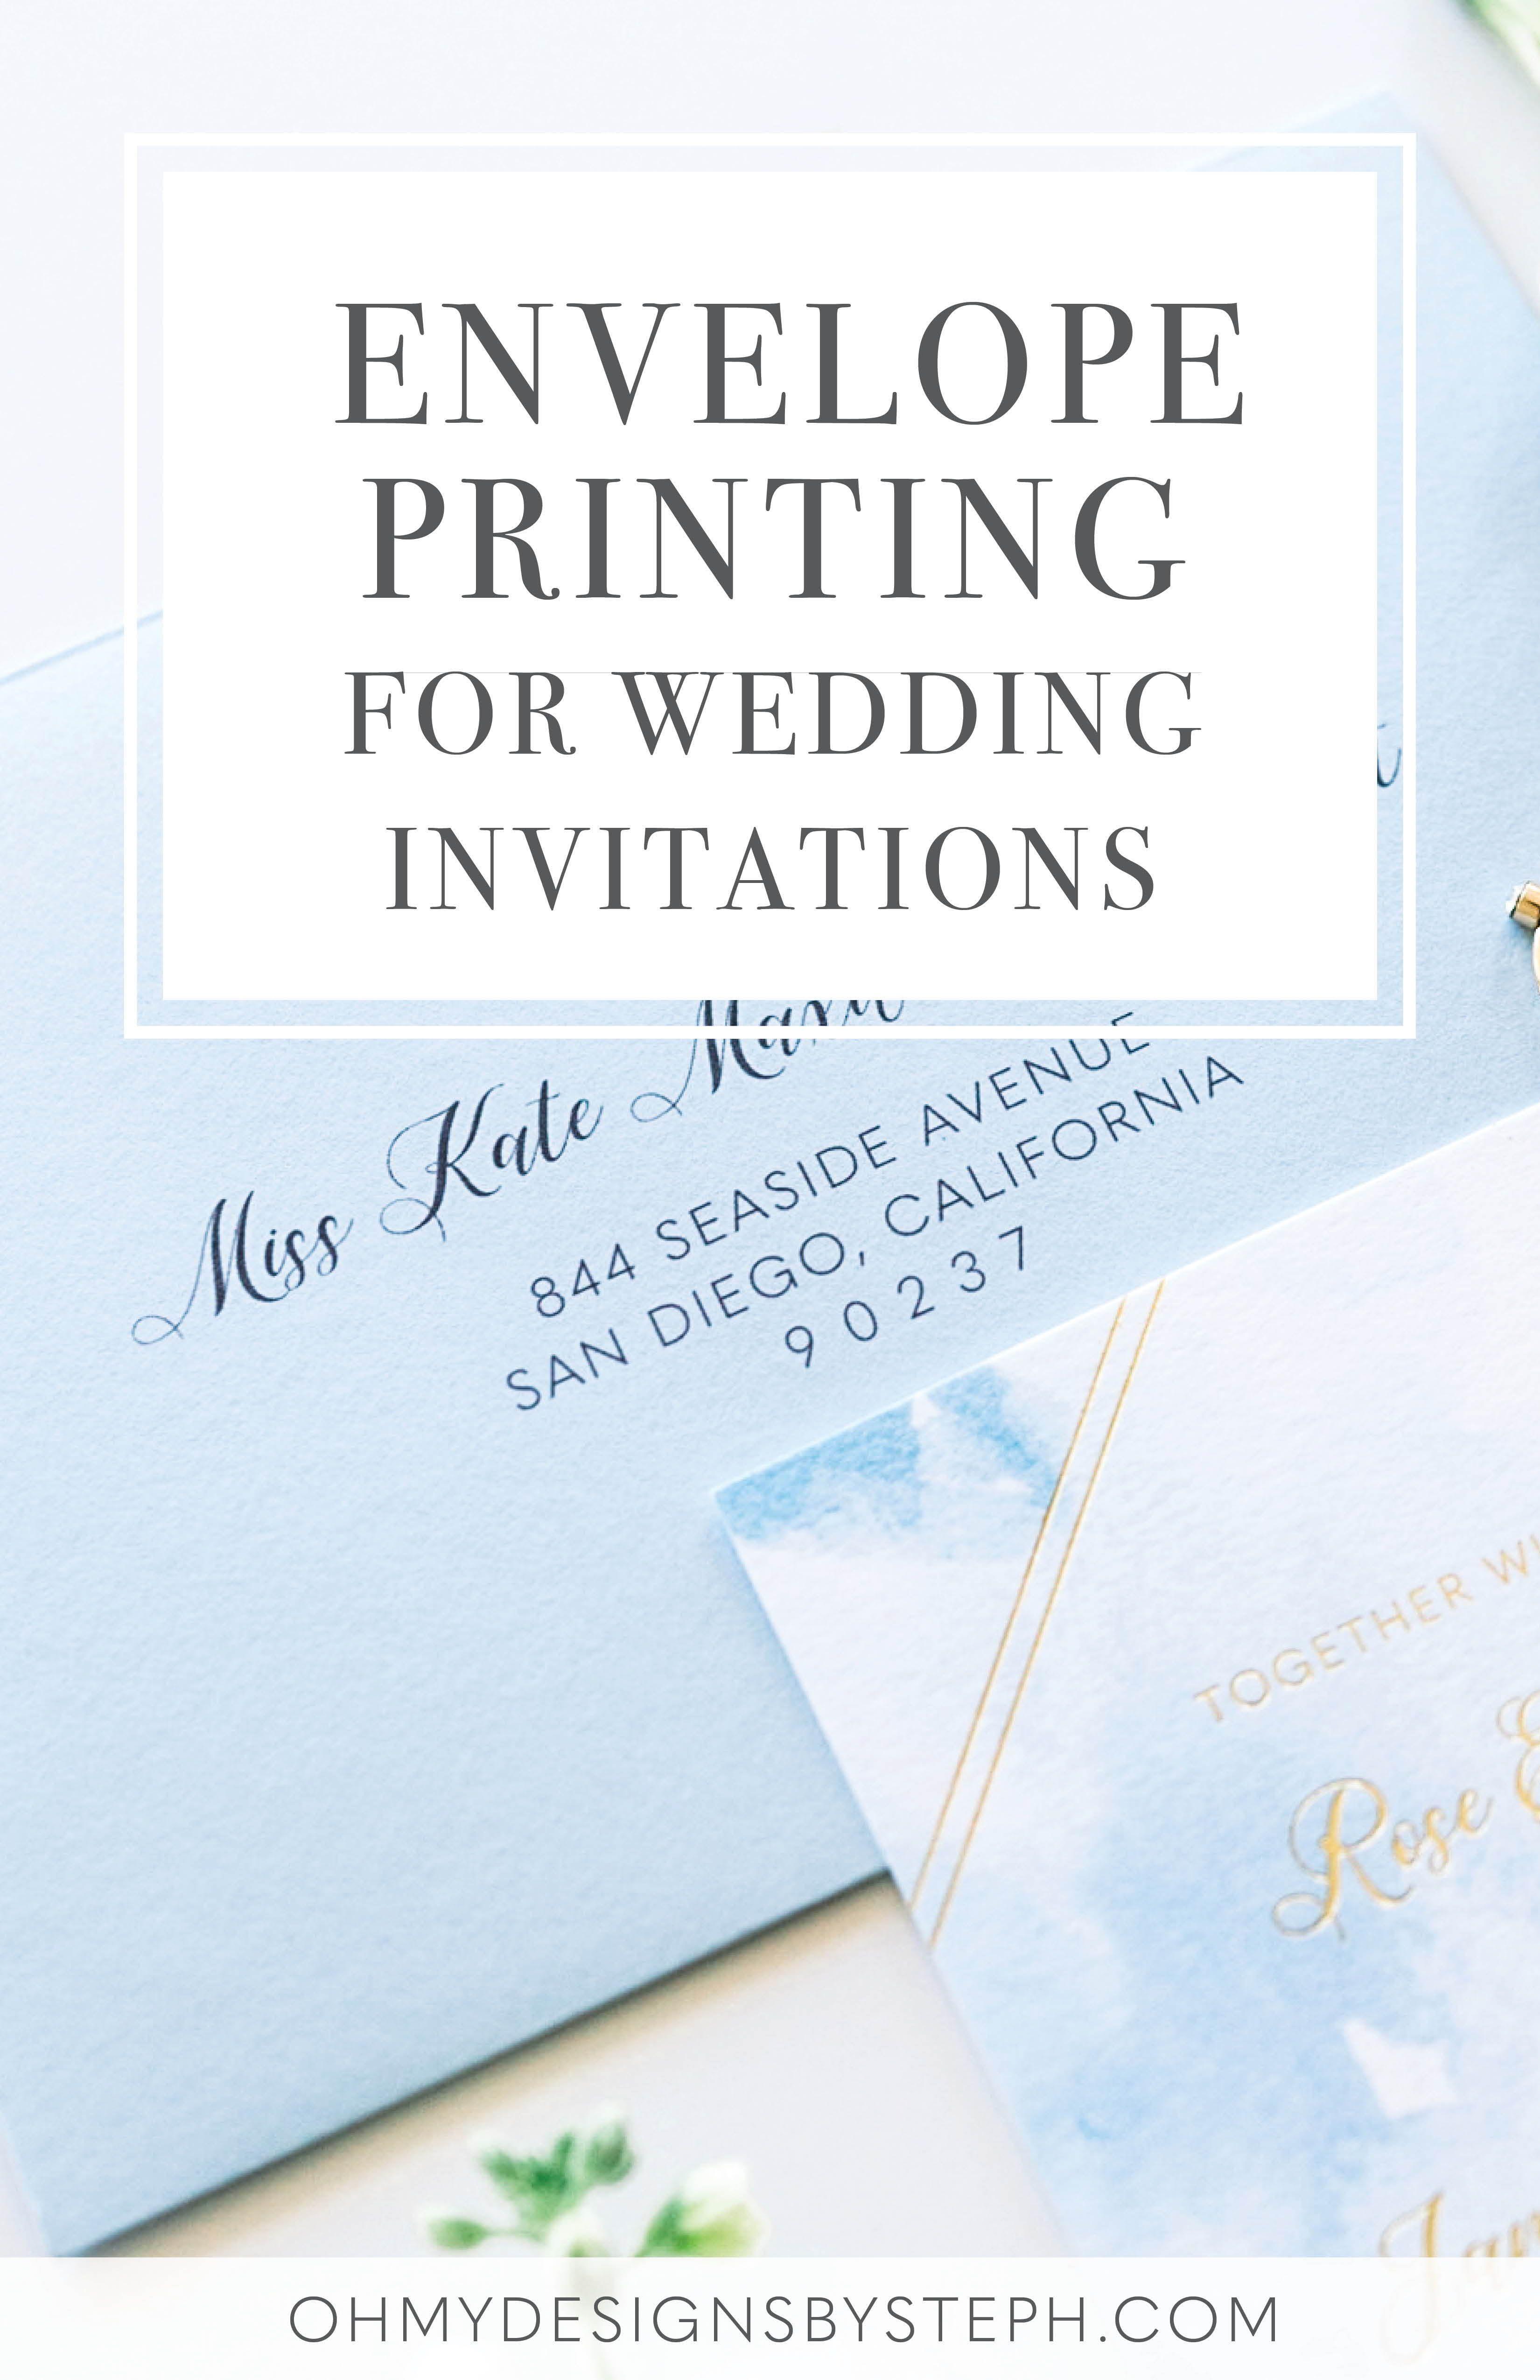 Envelope Printing for Wedding Invitations Printing